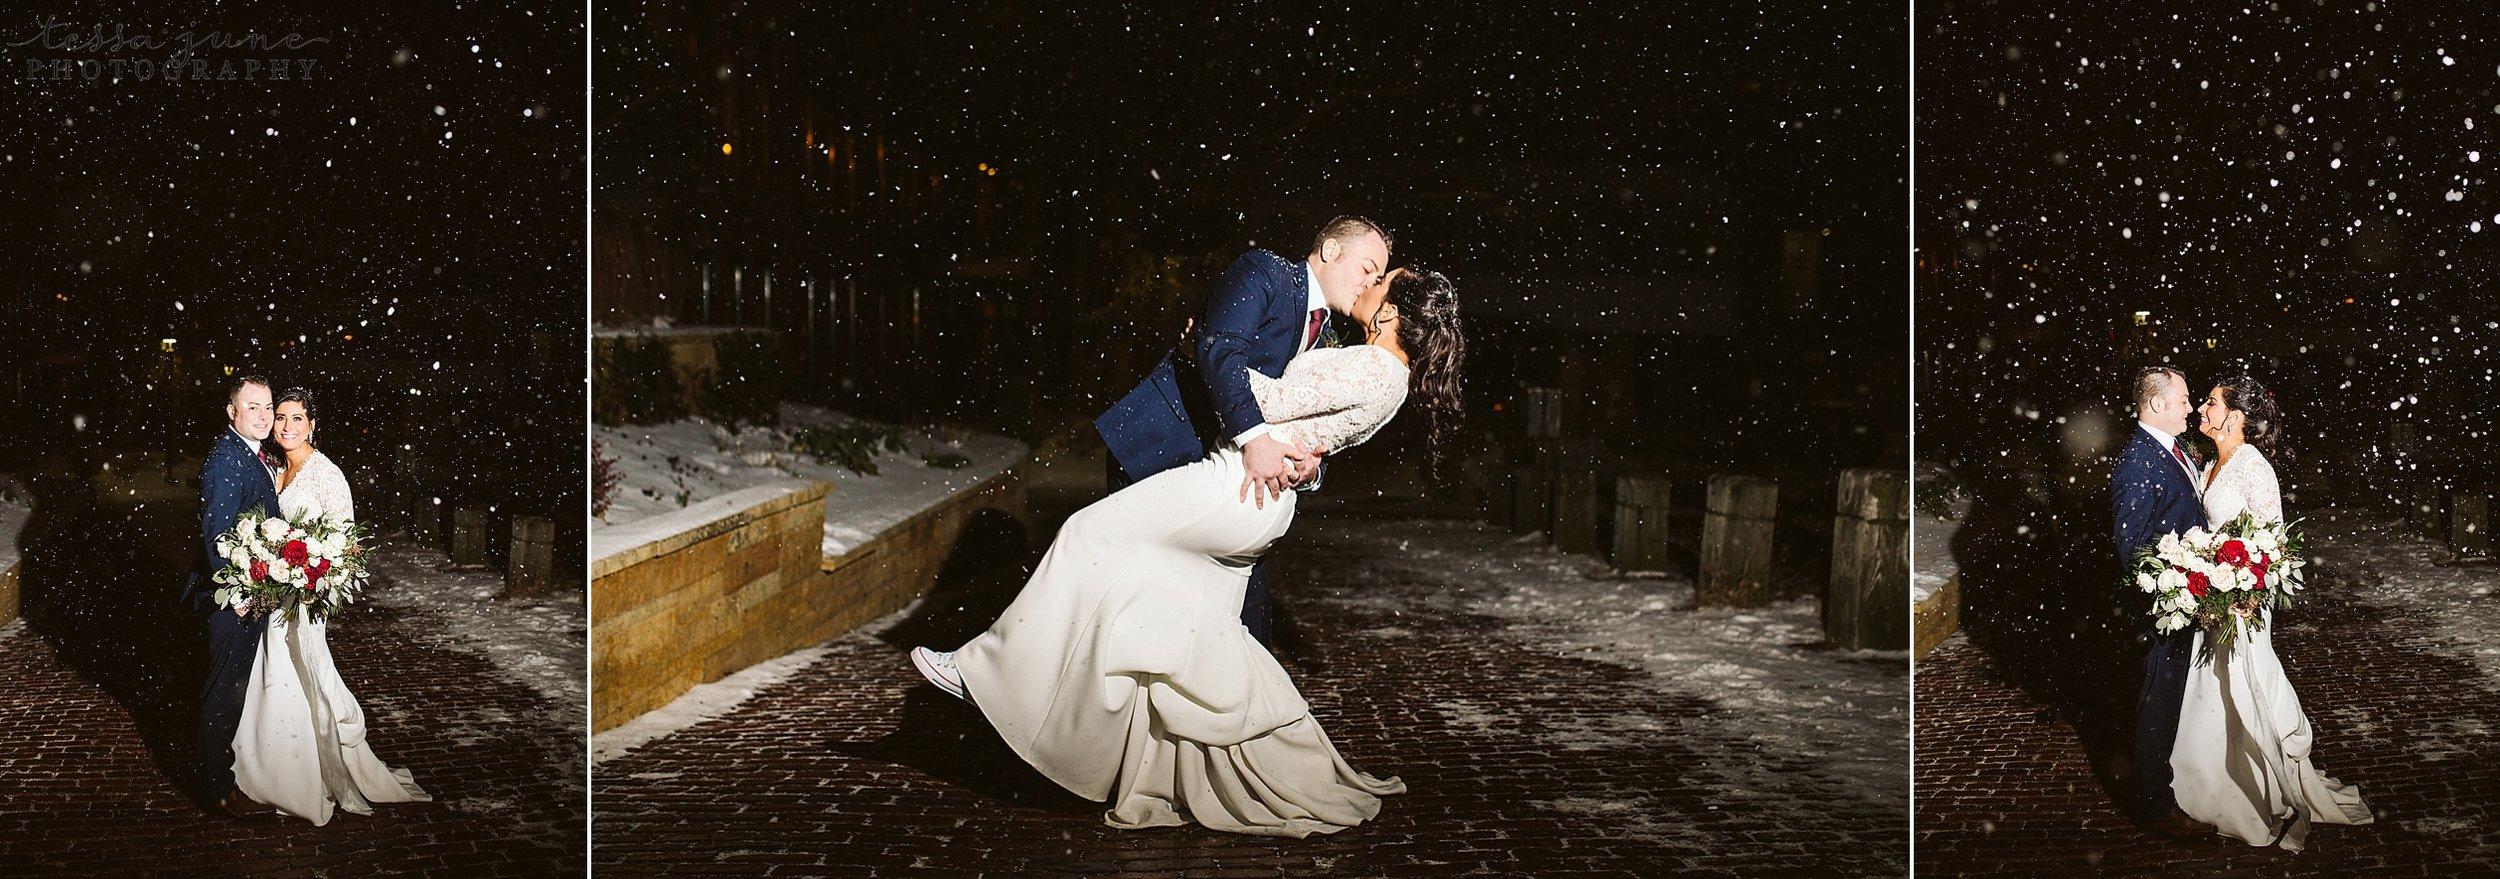 minneapolis-event-center-winter-romantic-snow-wedding-december-181.jpg